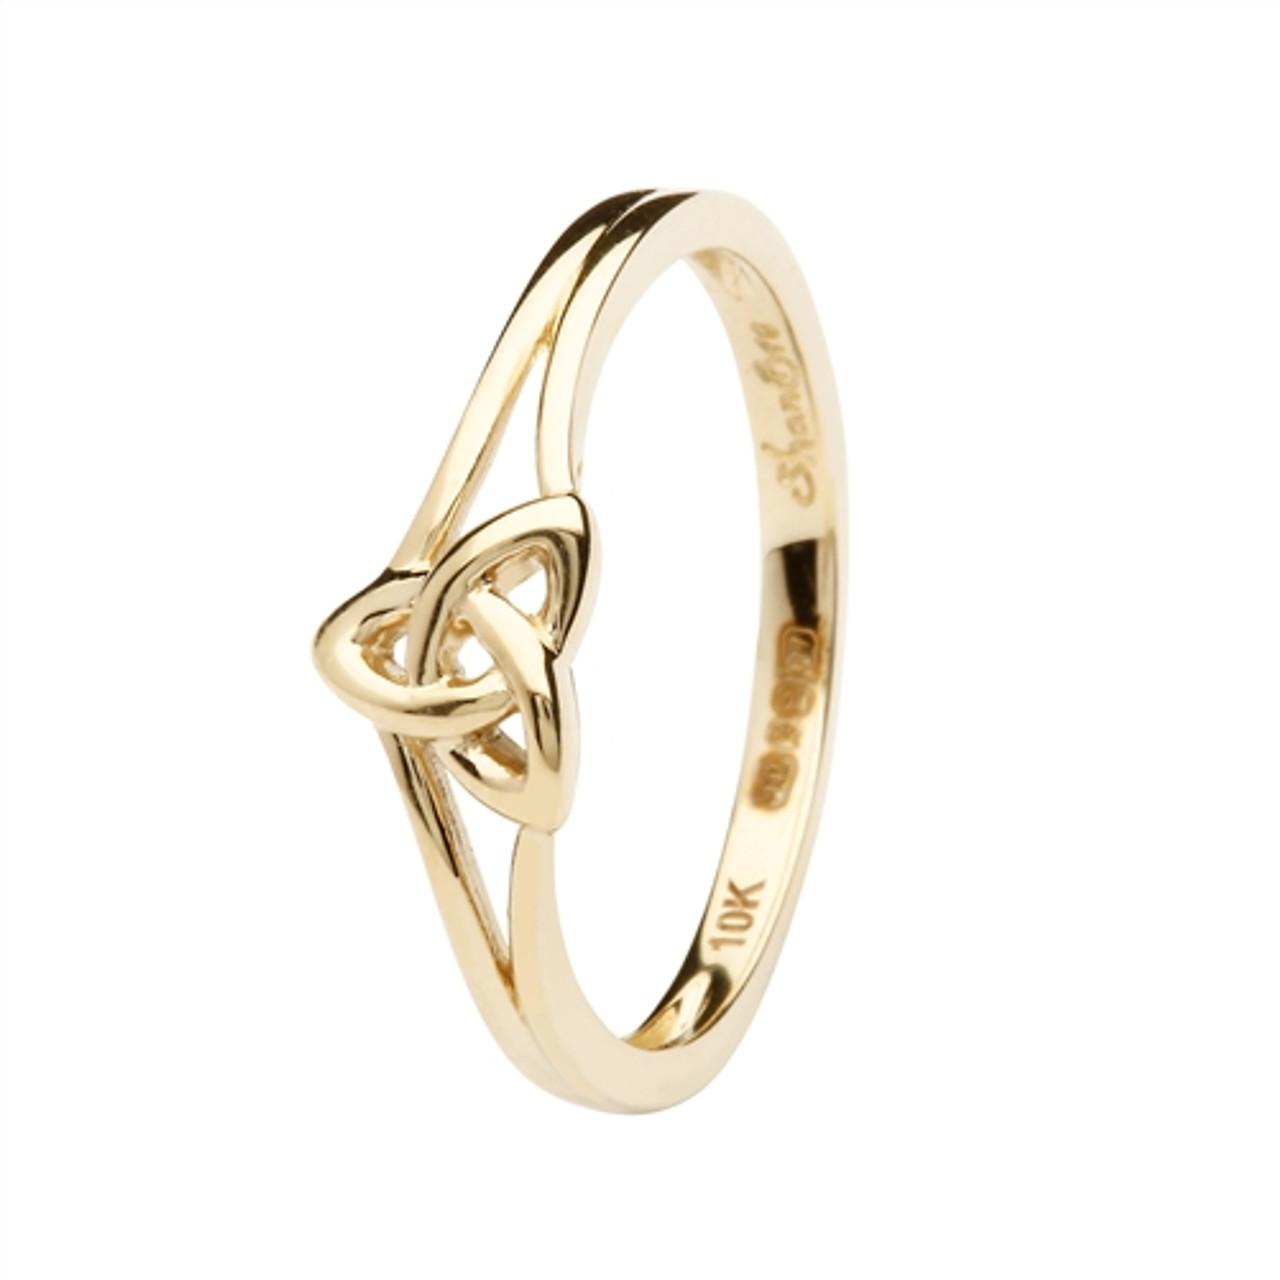 10k Yellow Gold Trinity Knot Ring Irish Gold Jewelry